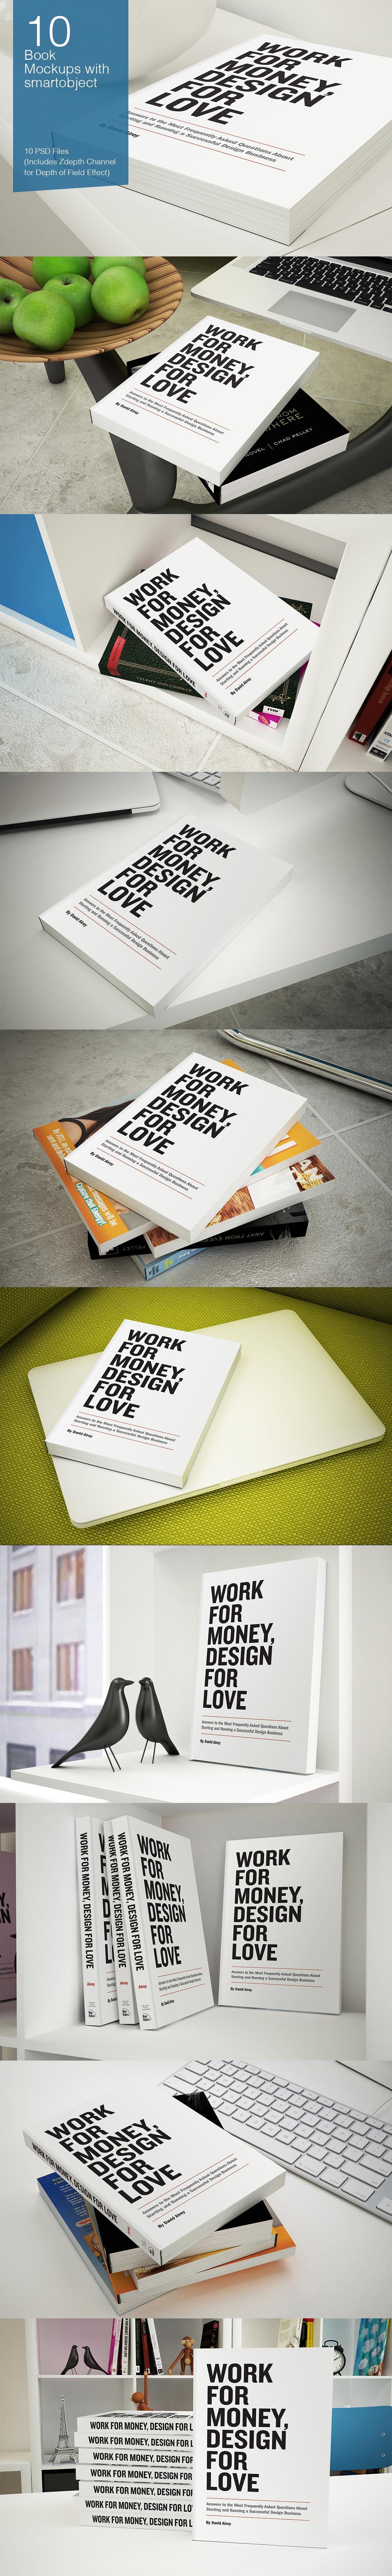 80 print and device mockups